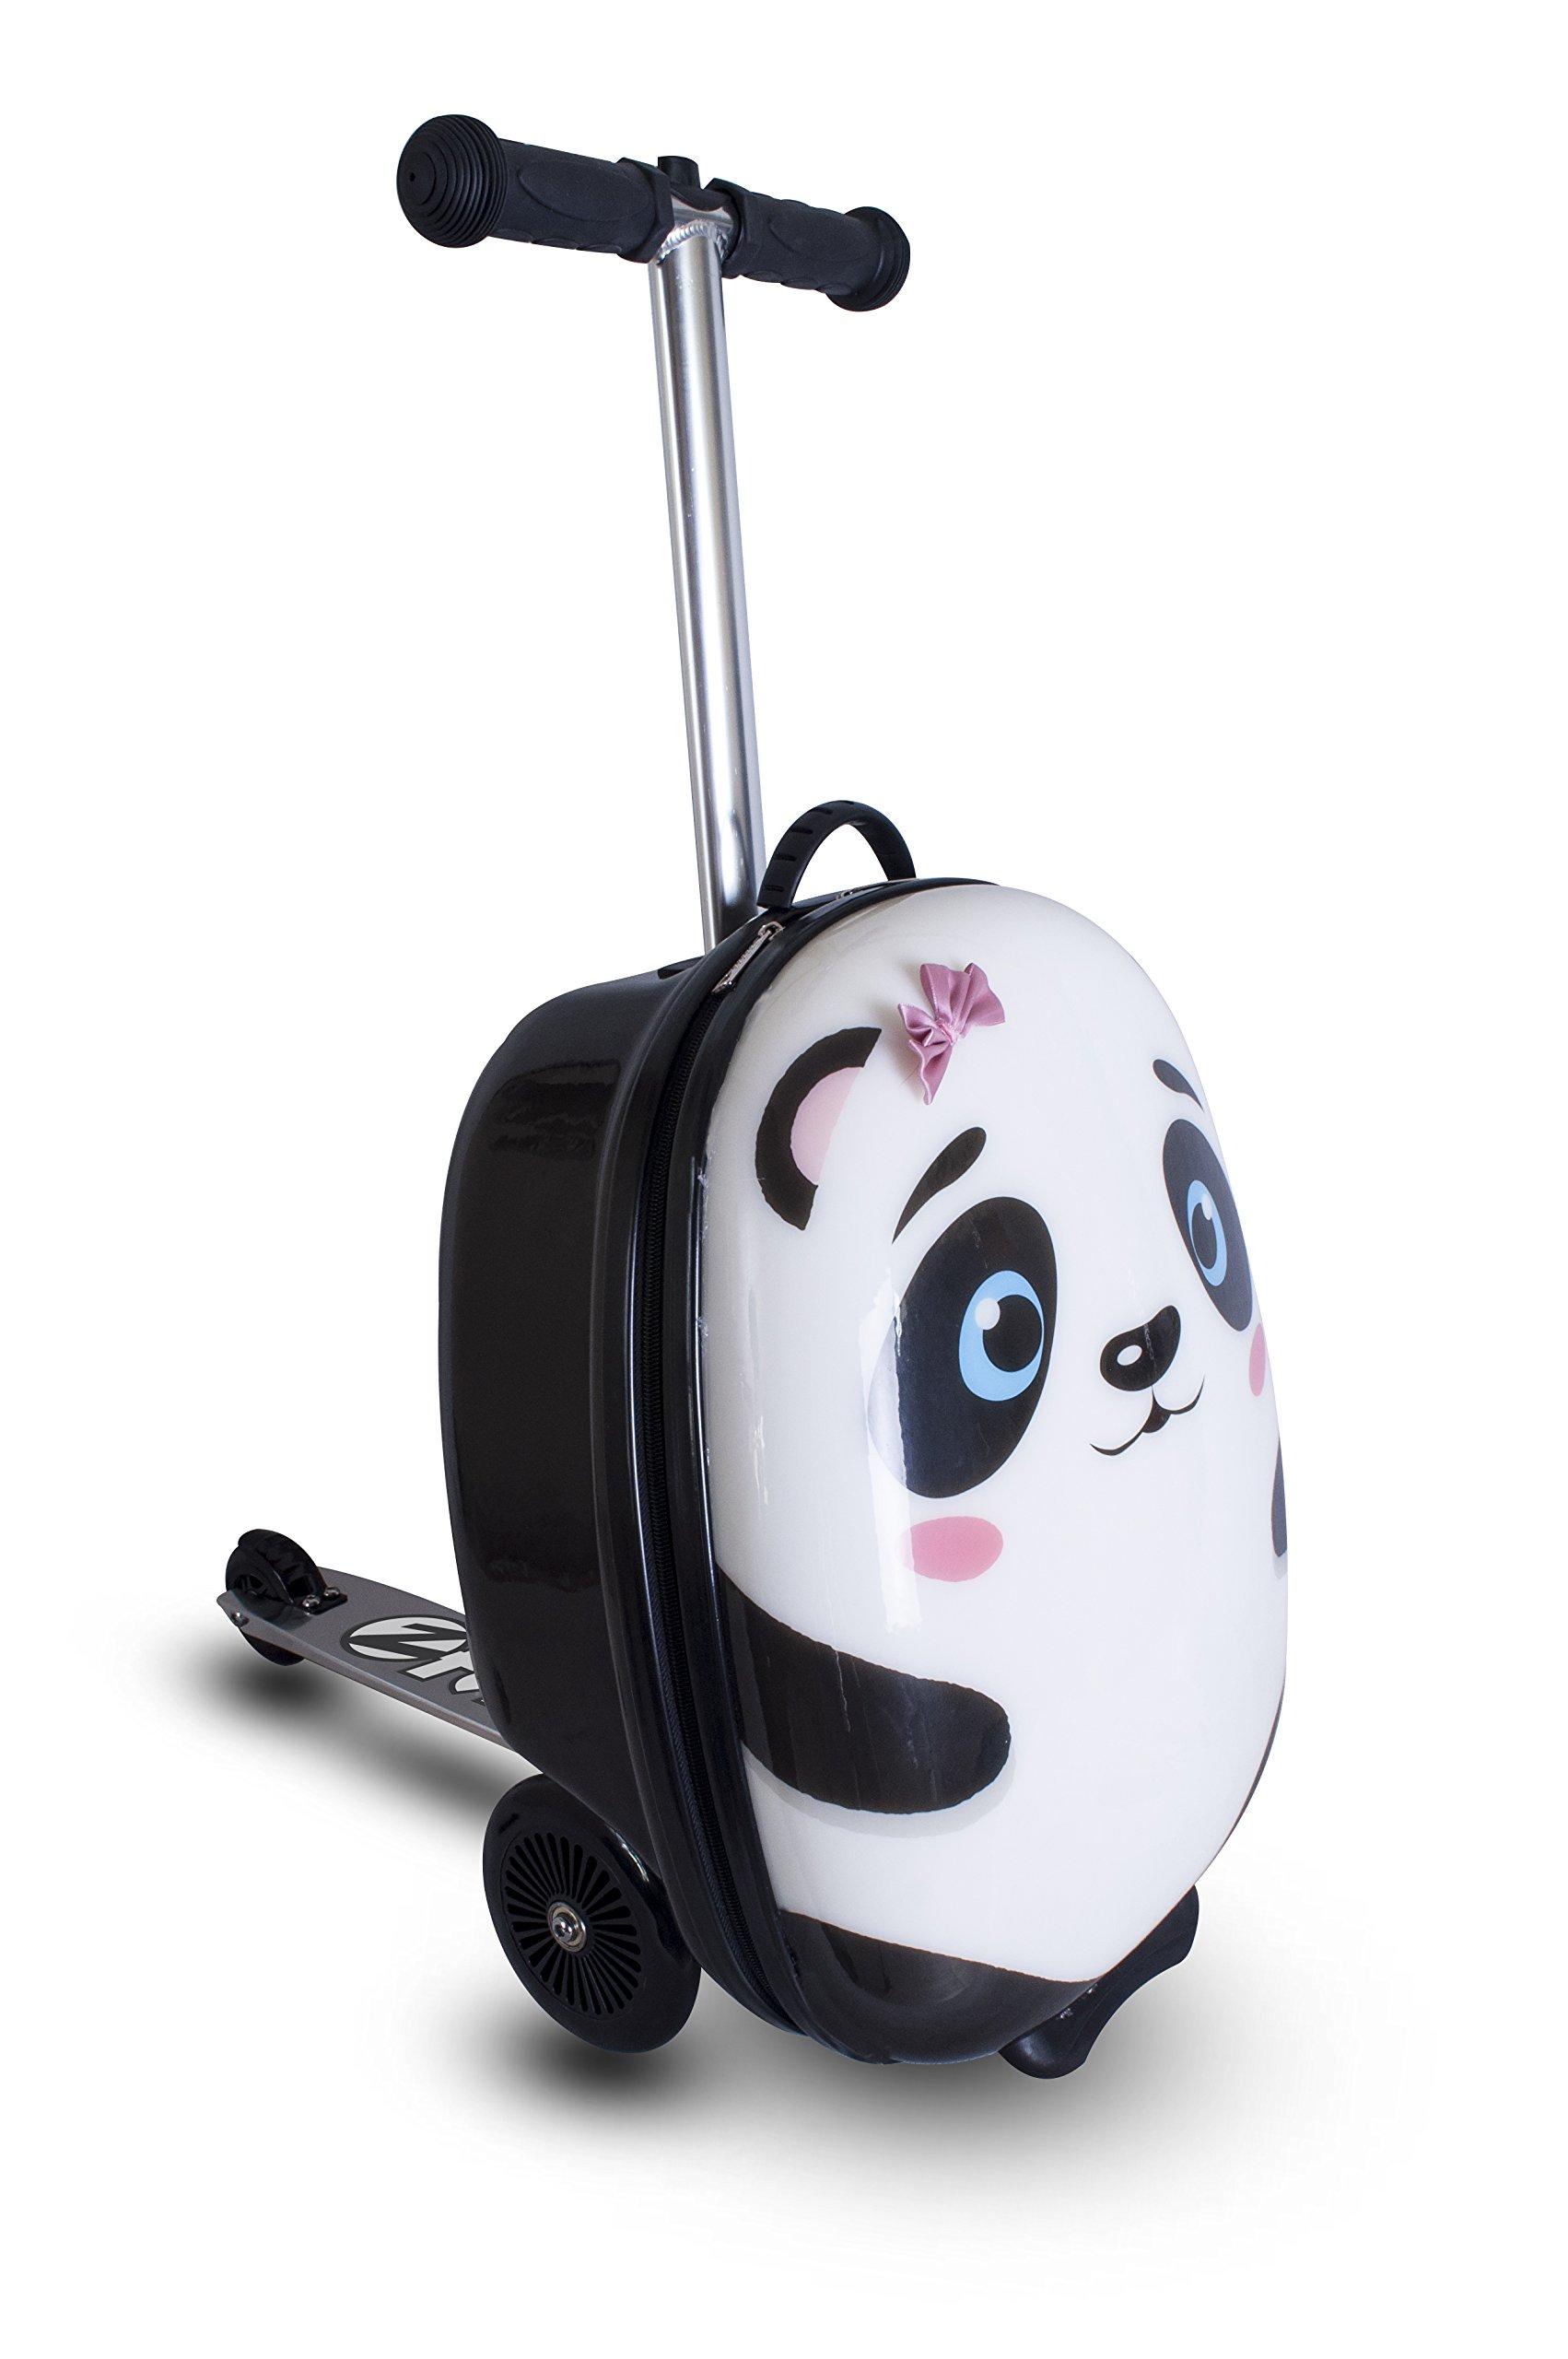 ZincFlyte Kid's Luggage Scooter 18'' - Polly the Panda by ZincFlyte (Image #1)